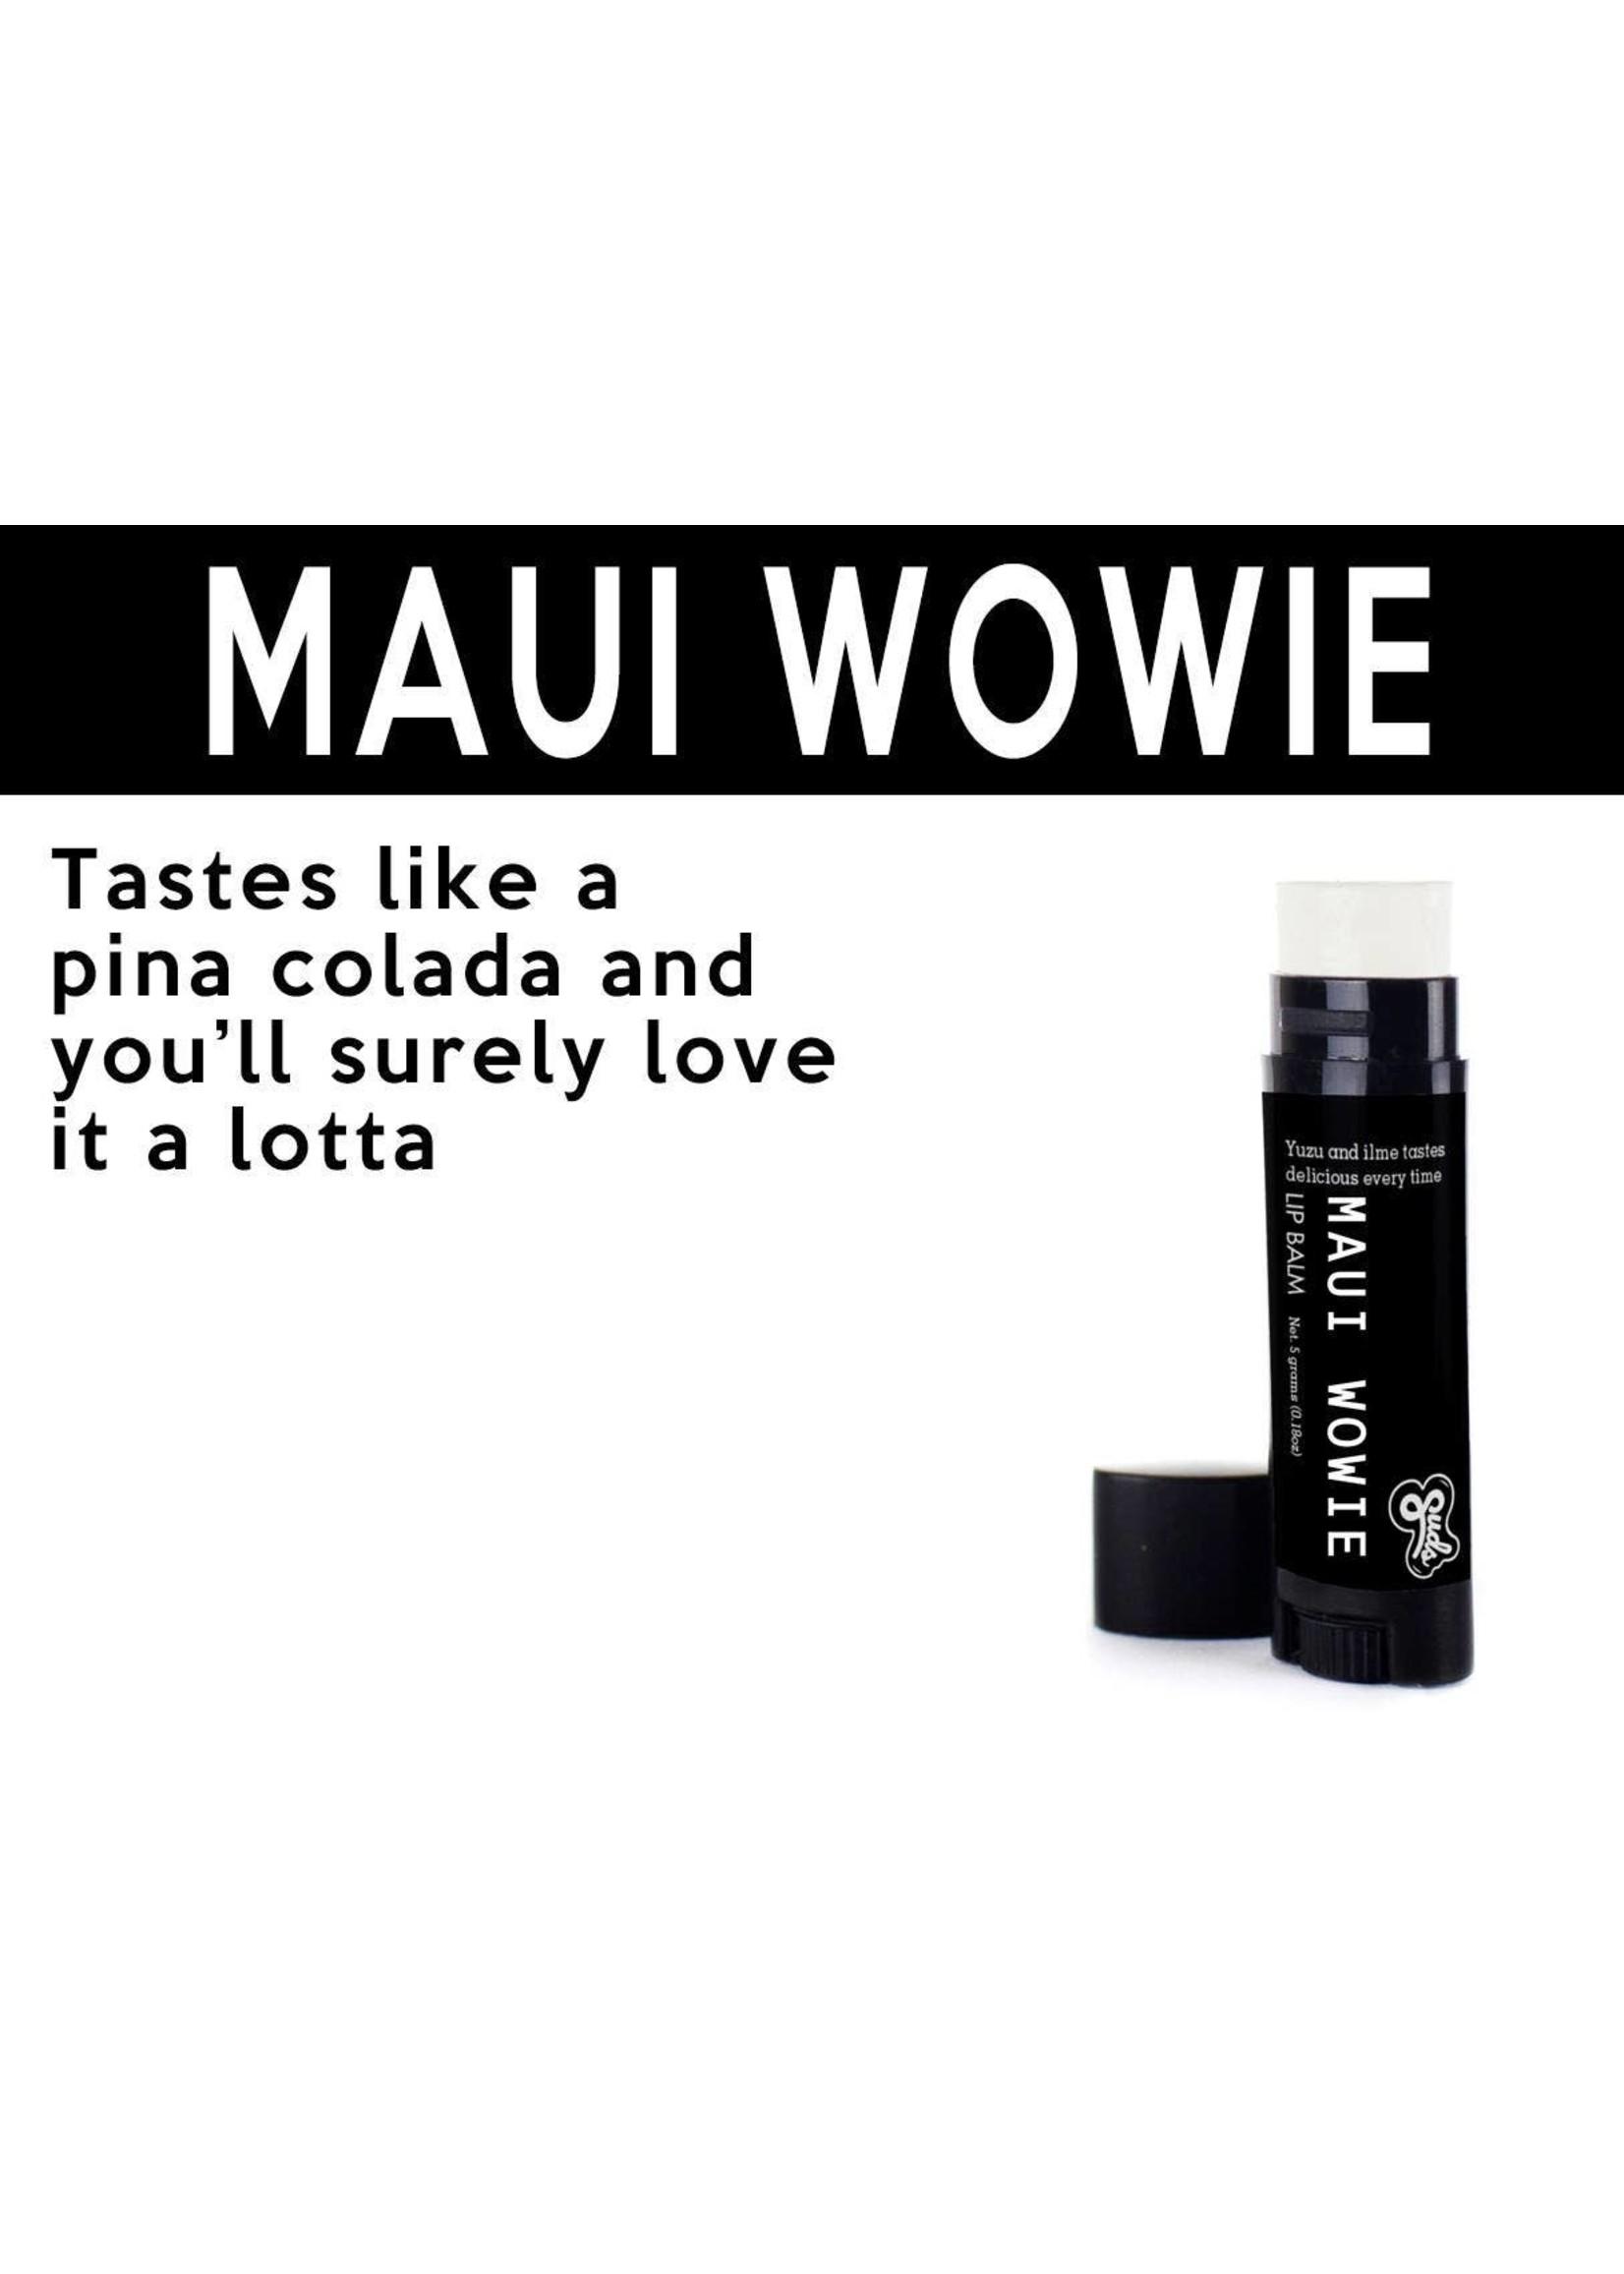 Sudsatorium Maui Wowie Lip Balm